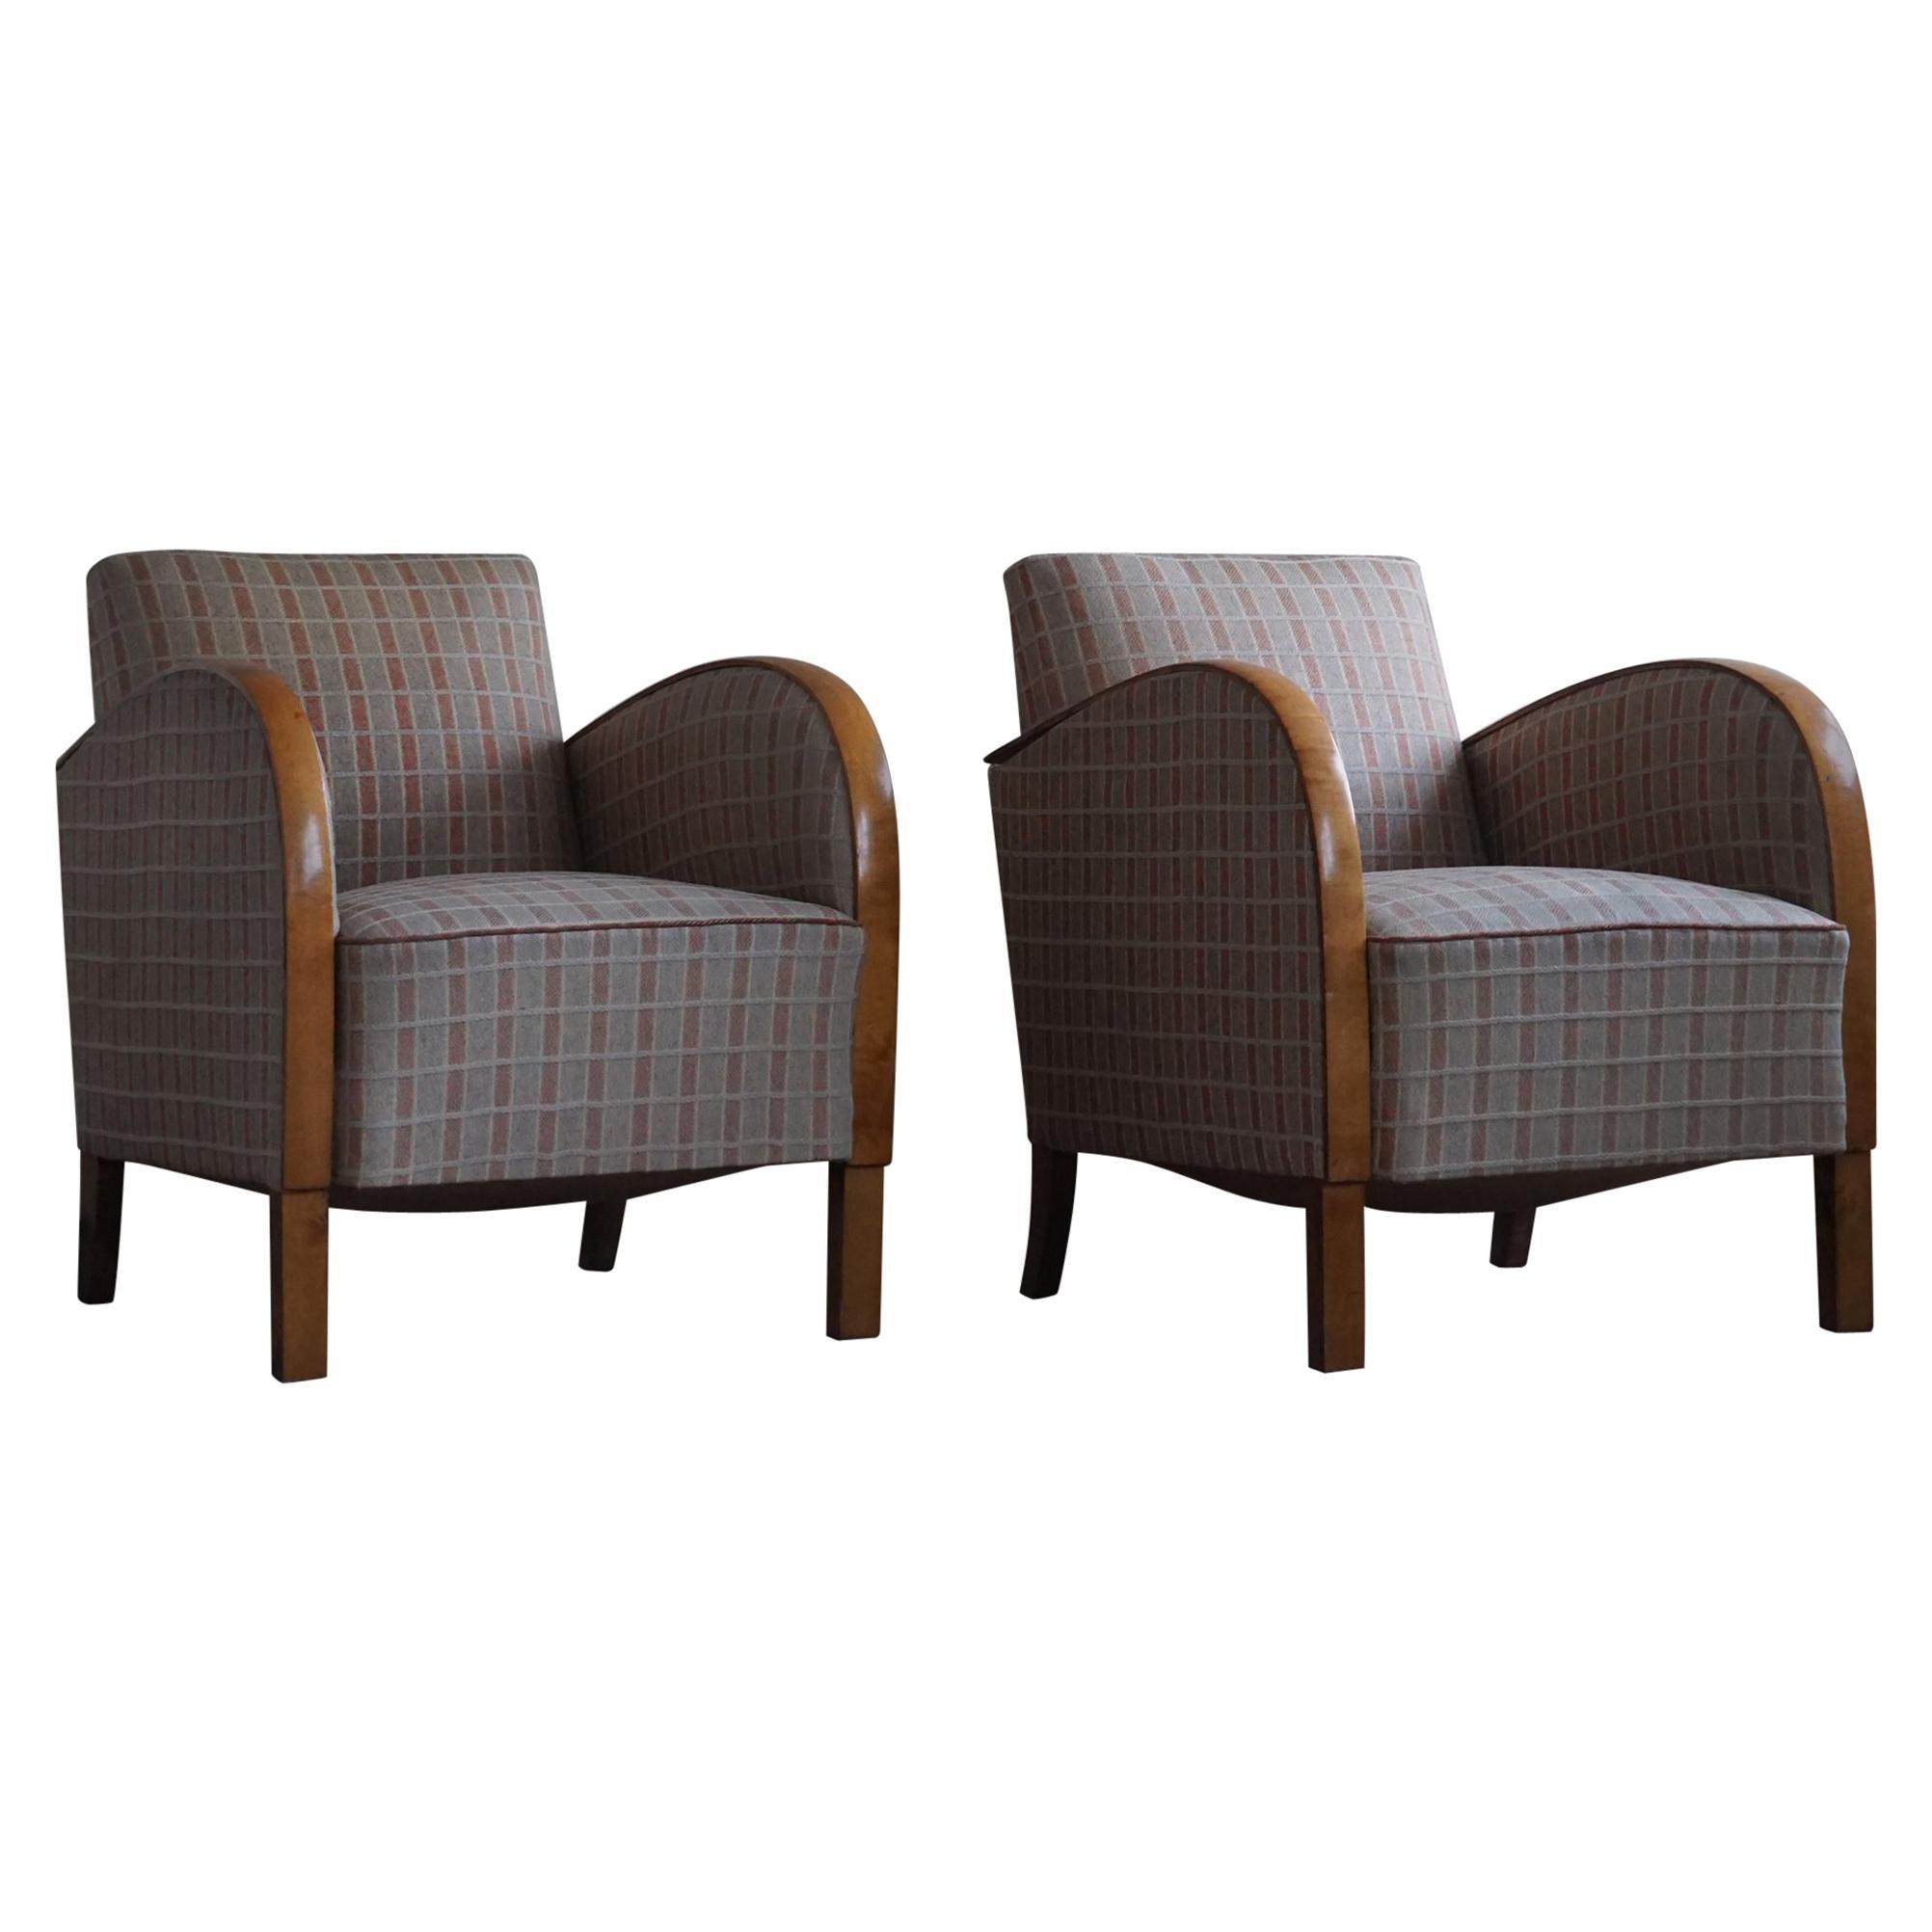 Scandinavian Easy Chairs, 1930s, Set of 2